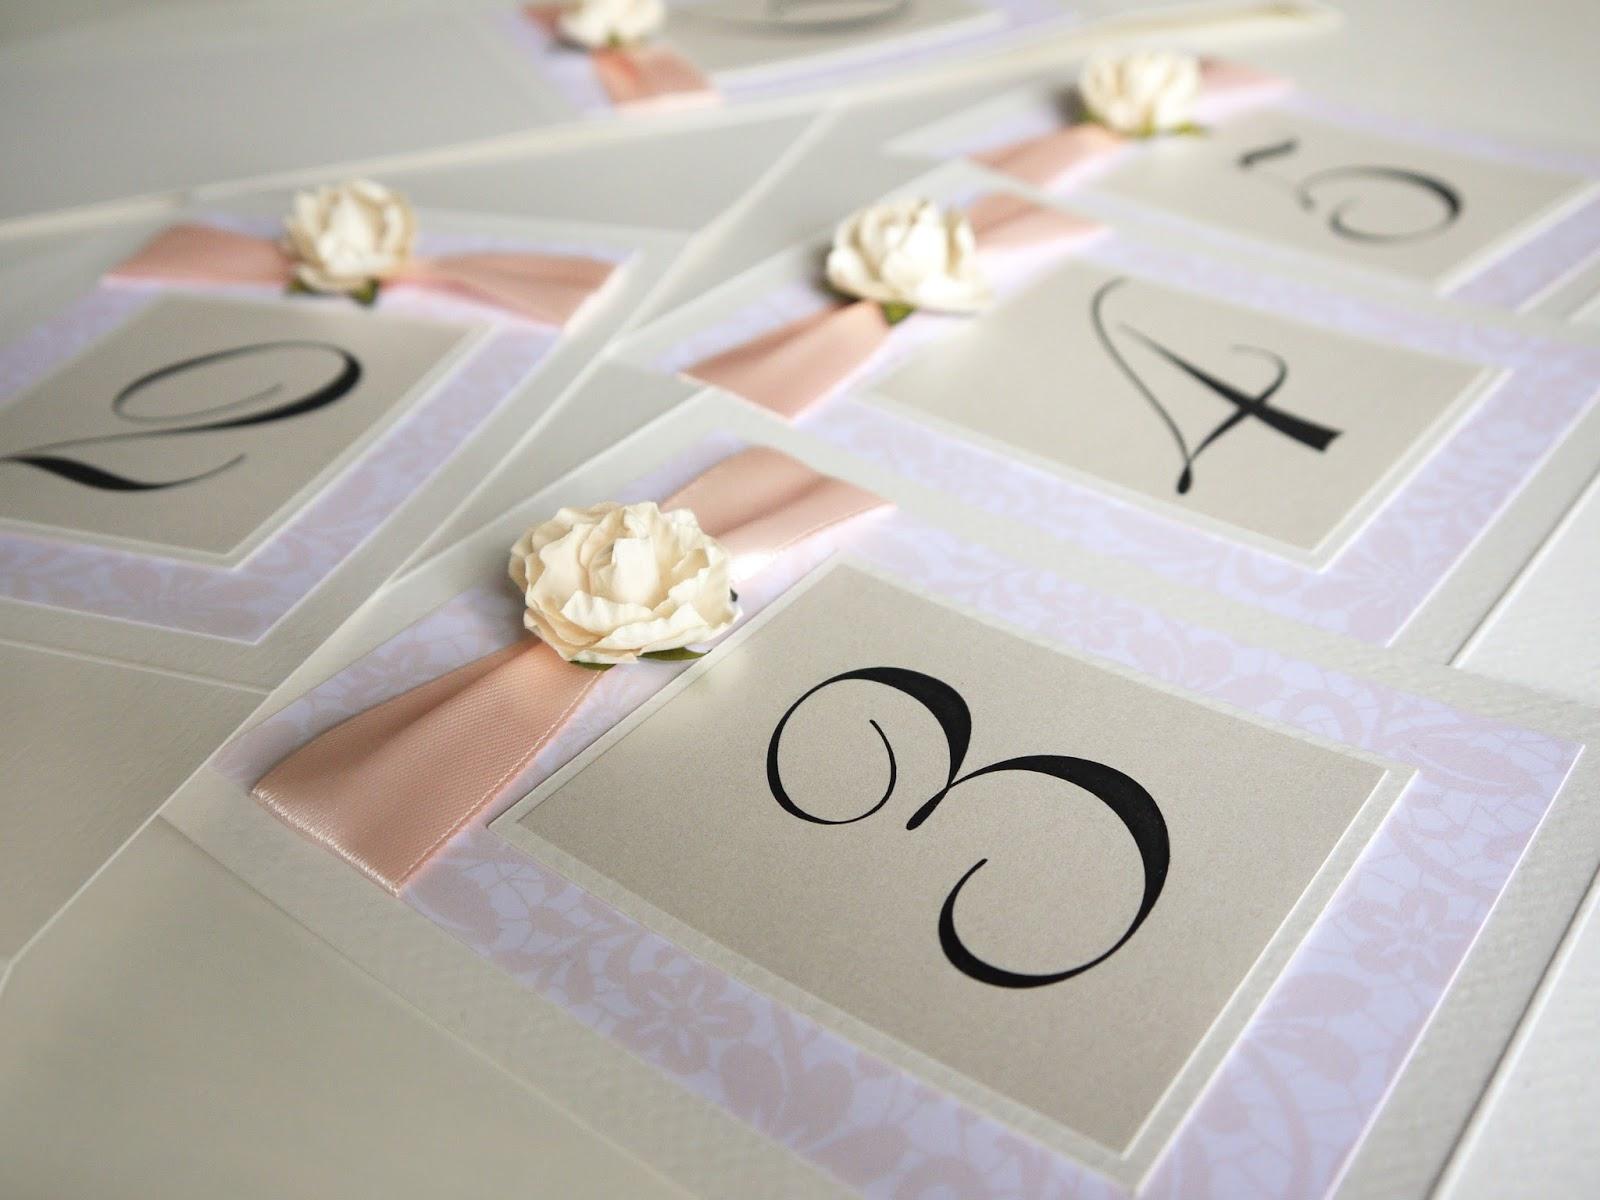 Открытки на стол для гостей на свадьбу шаблон, про любовь